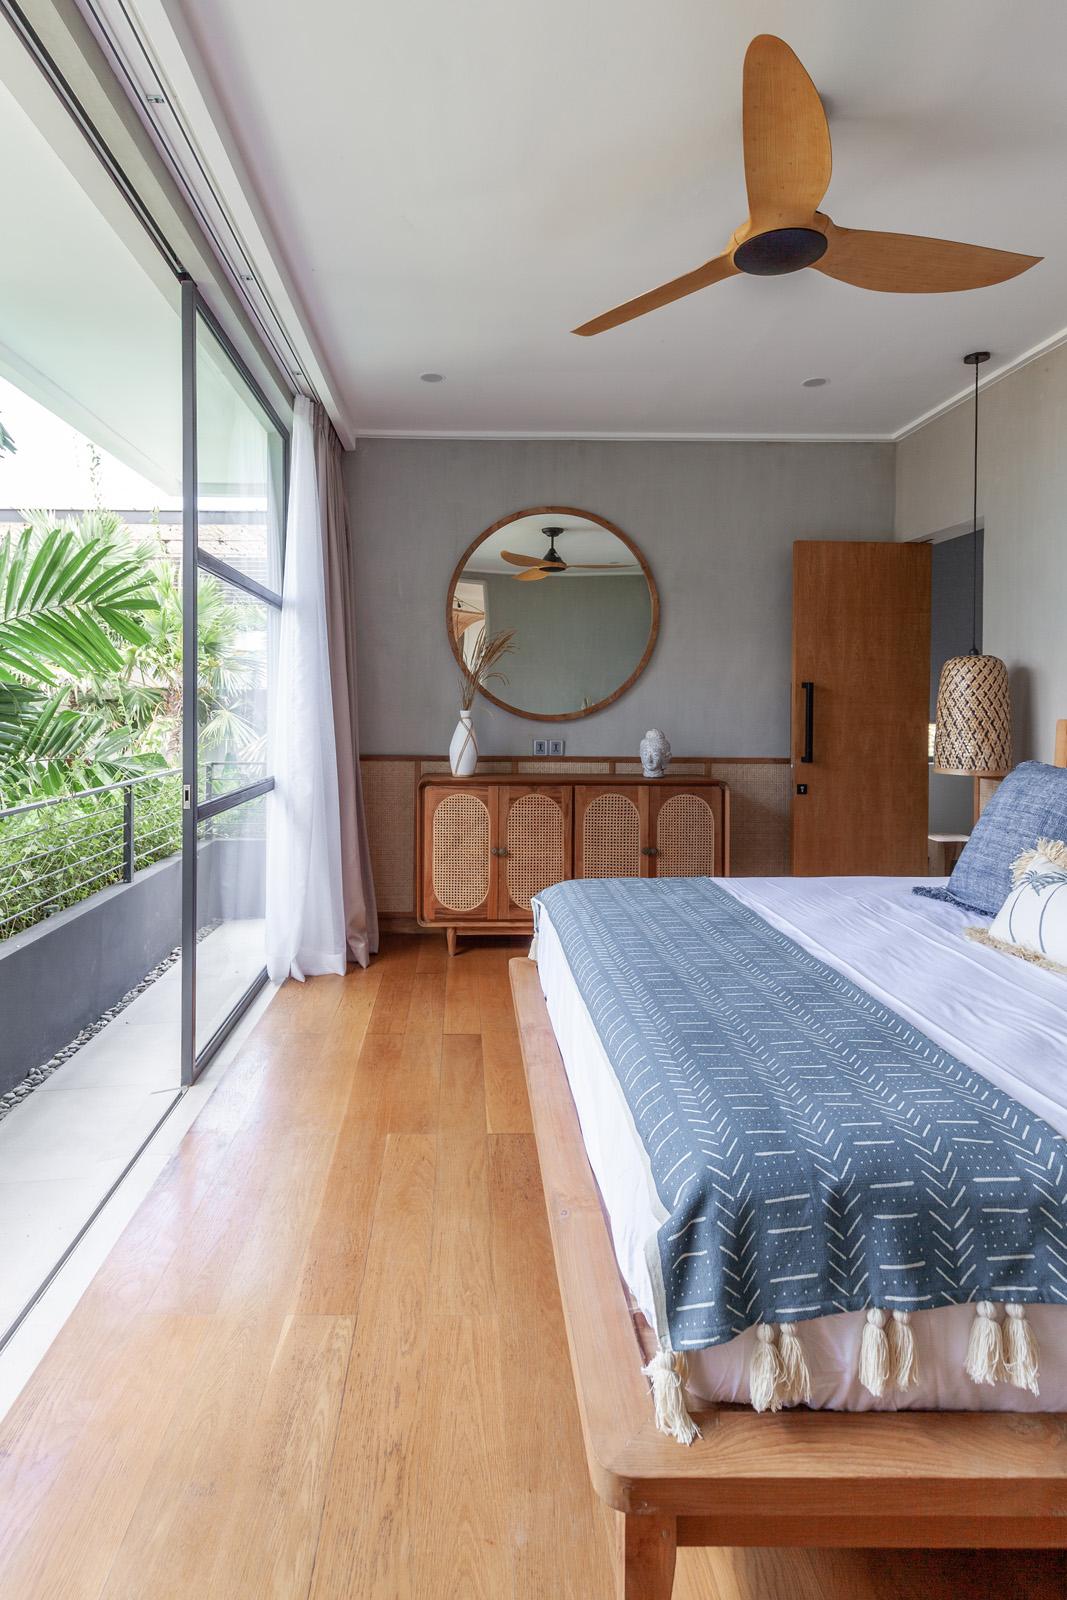 Azula House, Bali Interiors, Canggu, Villa, Azula House, Bali Interiors, Canggu, Villa, Azula House, Bali Interiors, Canggu, Villa,